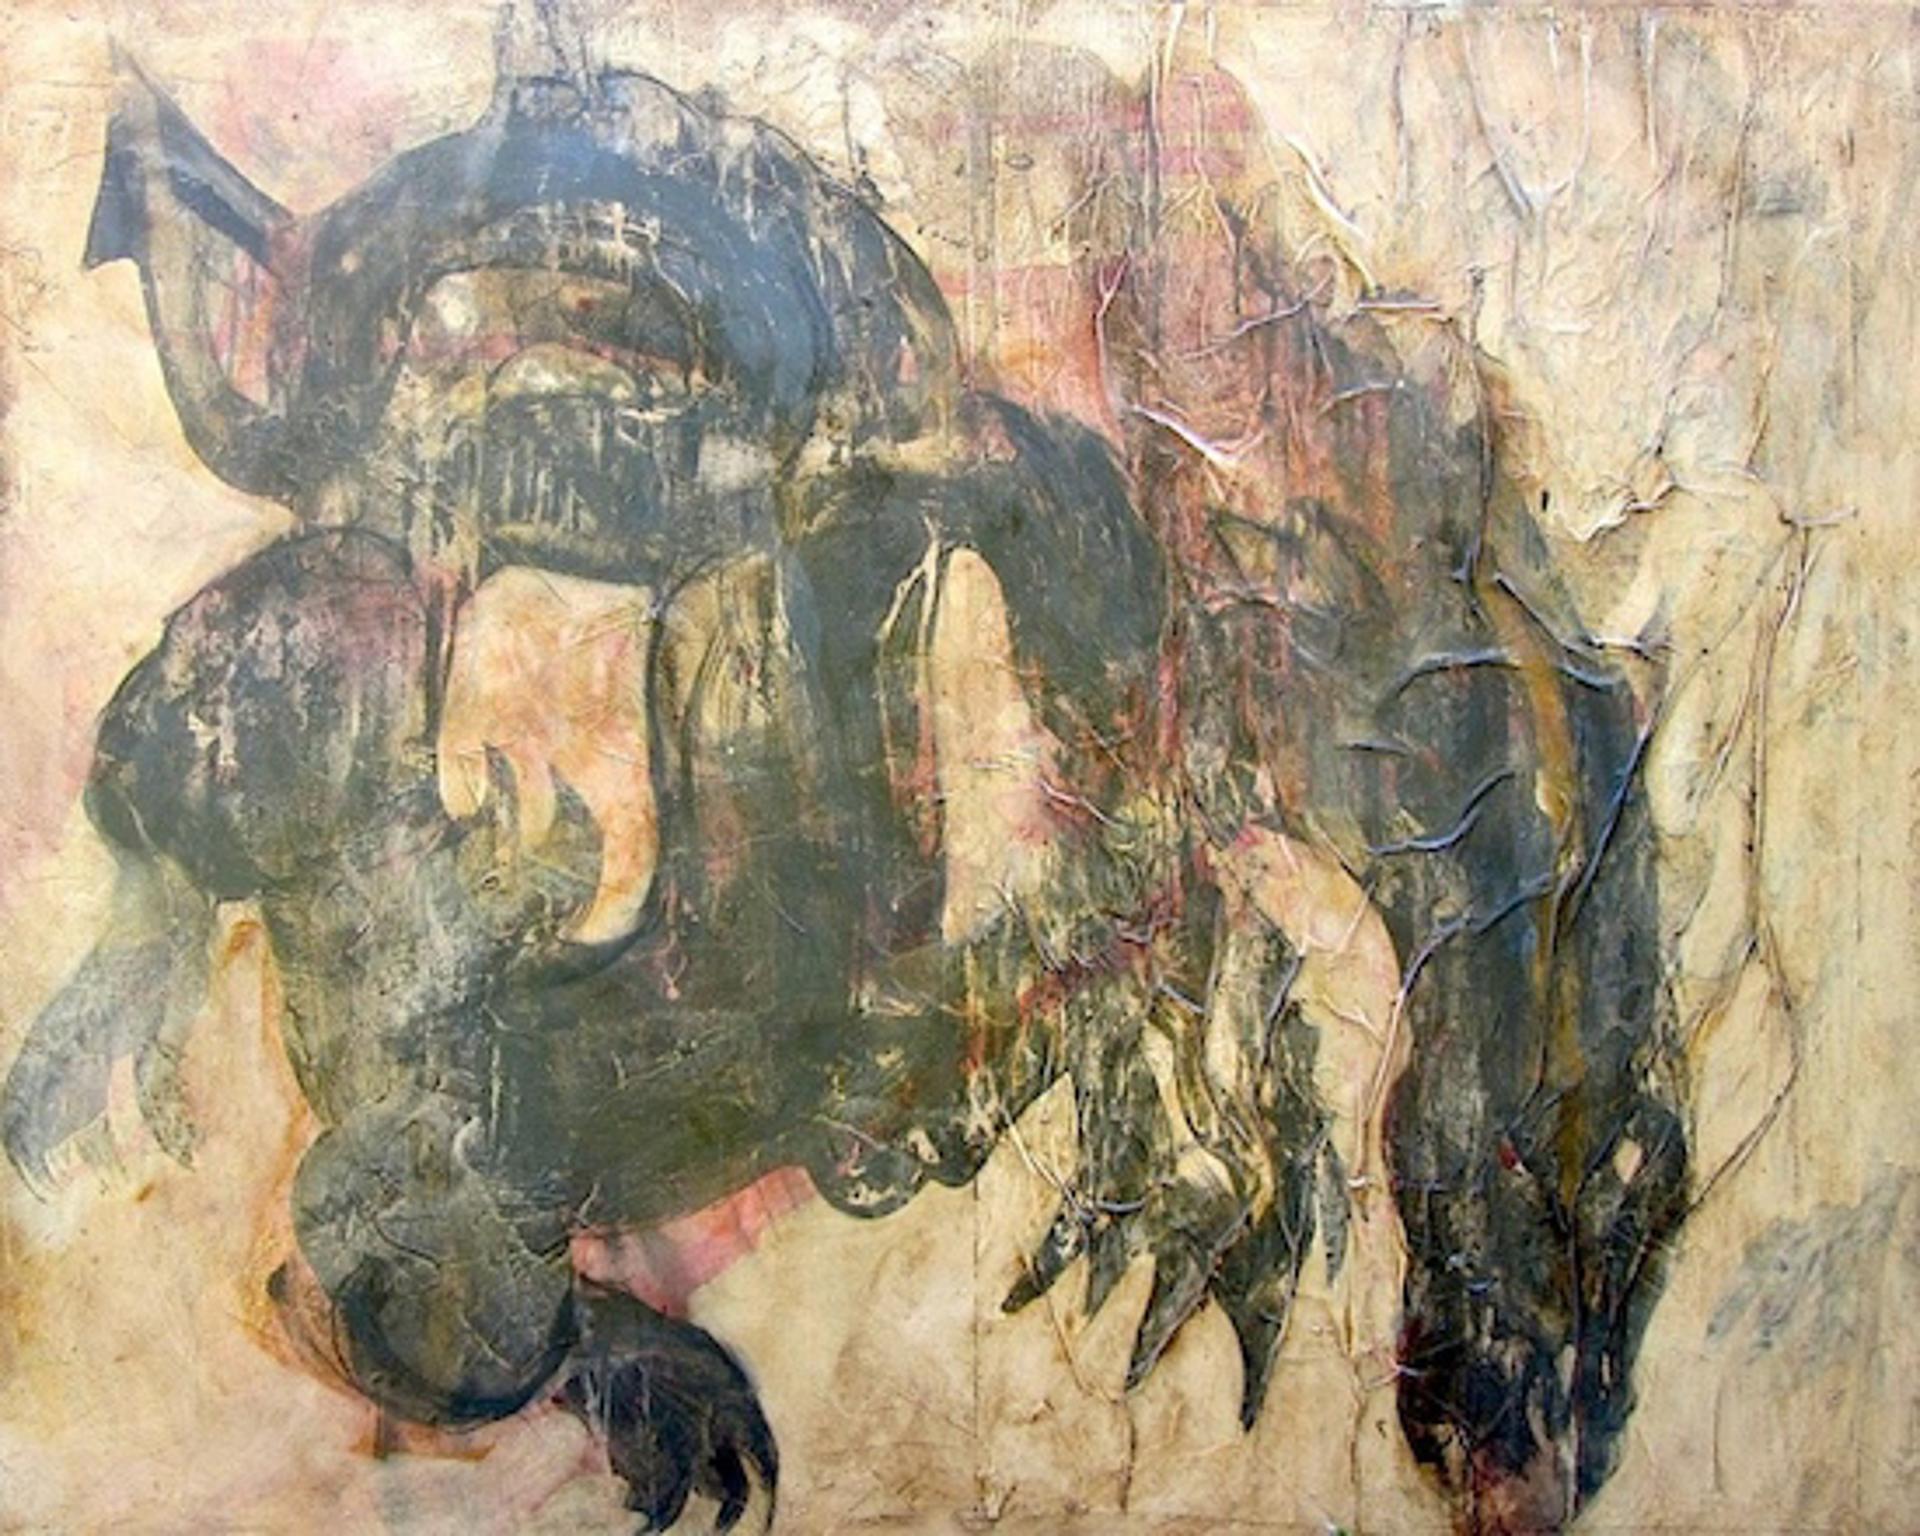 Dragon II by Chrissy Dolan-Terrasi